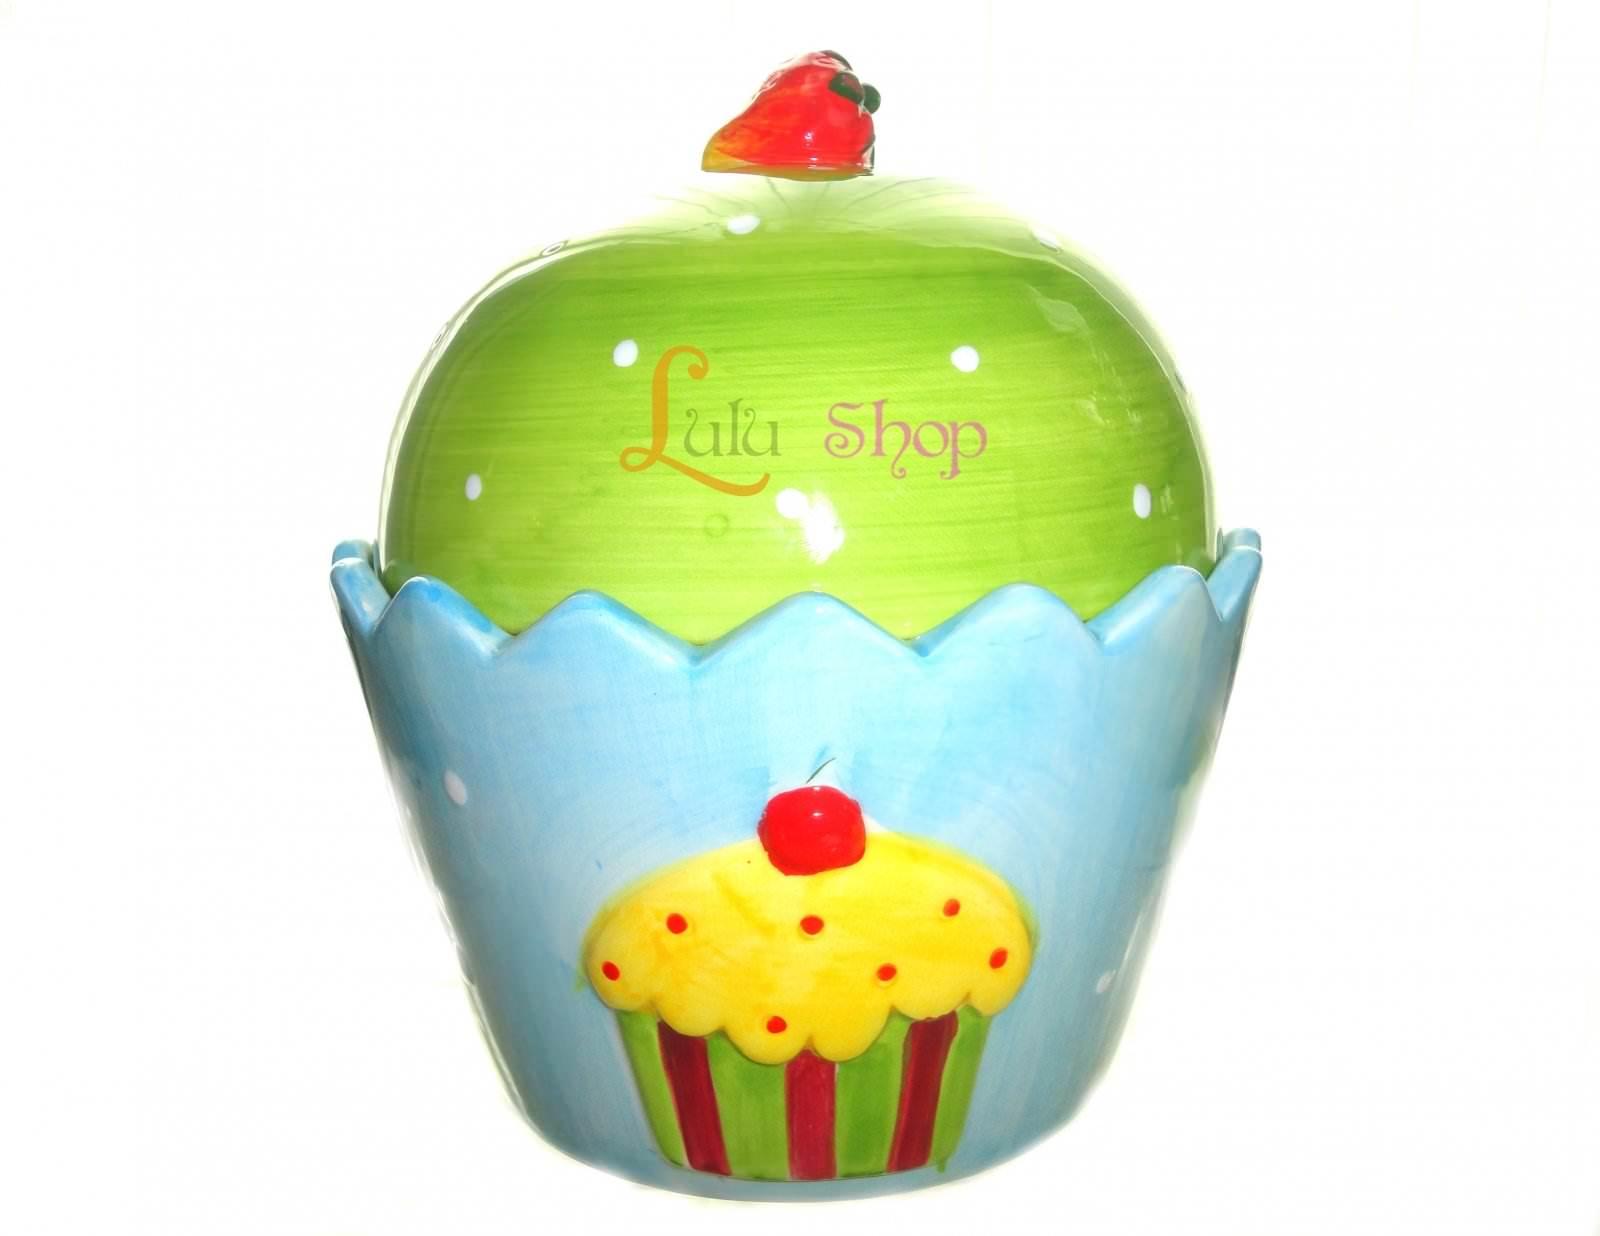 Lulu Shop Art de la table design boîte Bleu